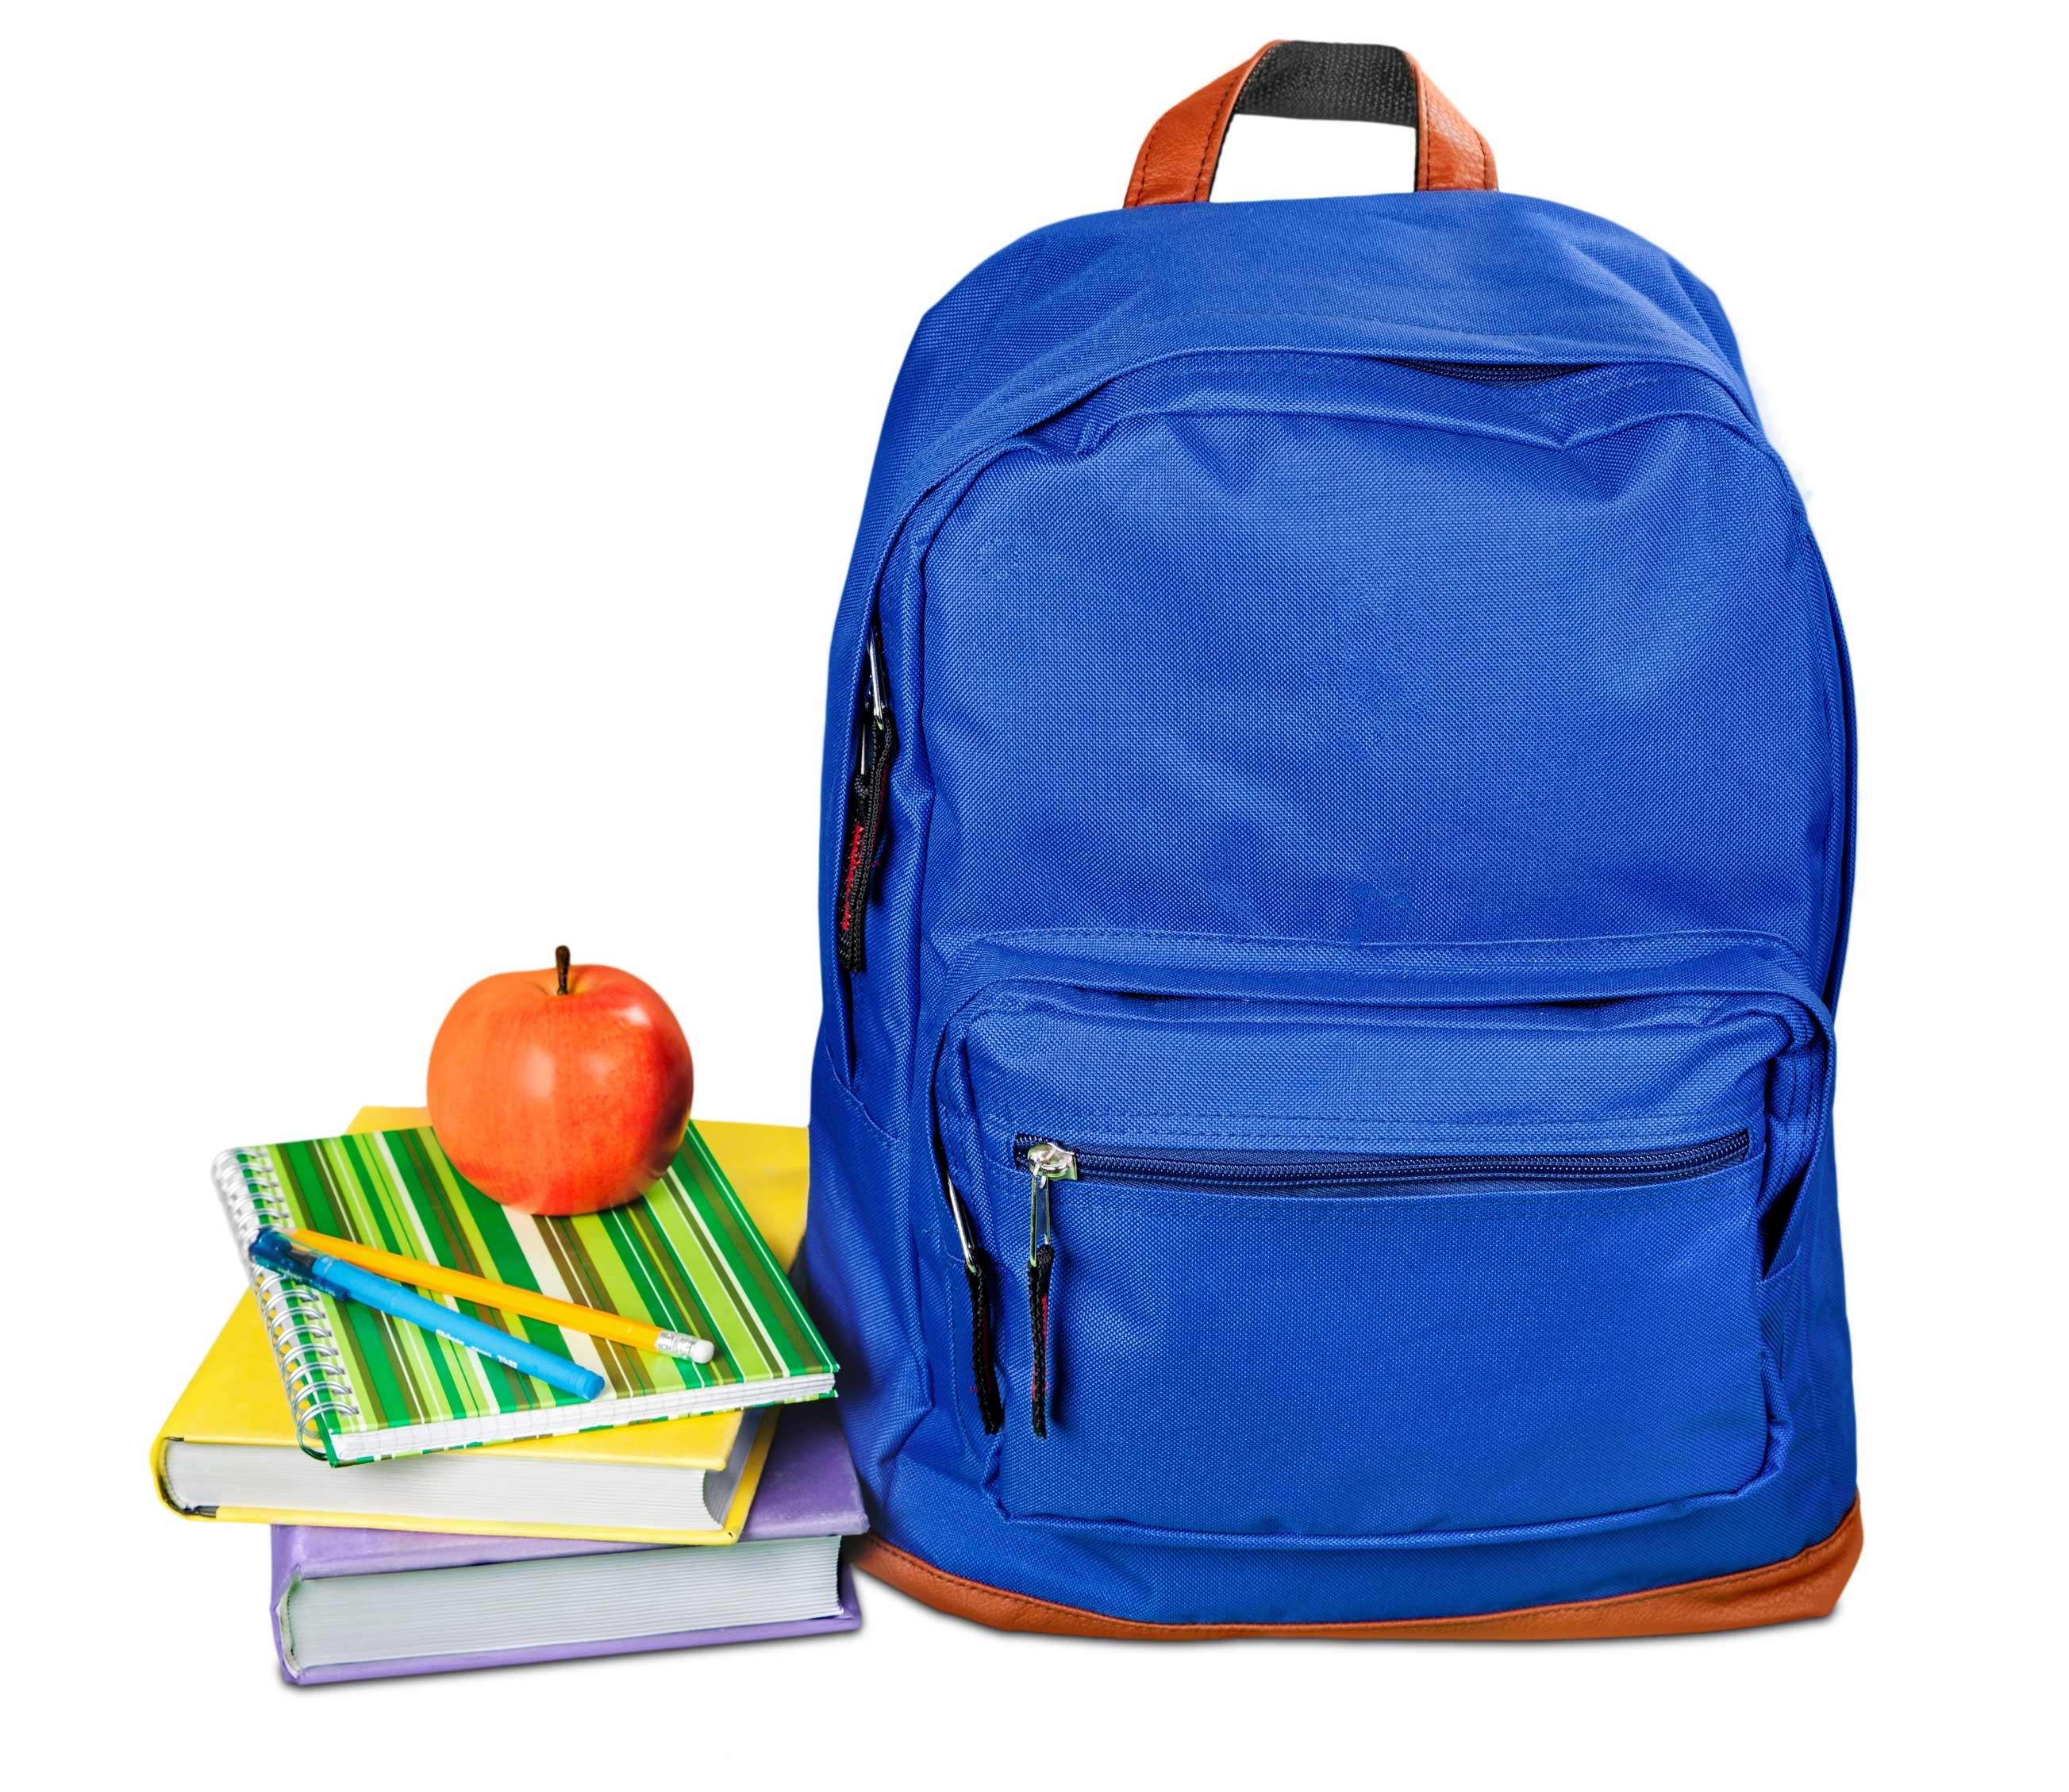 school-backpack-private-school-public-school-Brunswick-Crossing-new-home-Frederick-Maryland.jpg